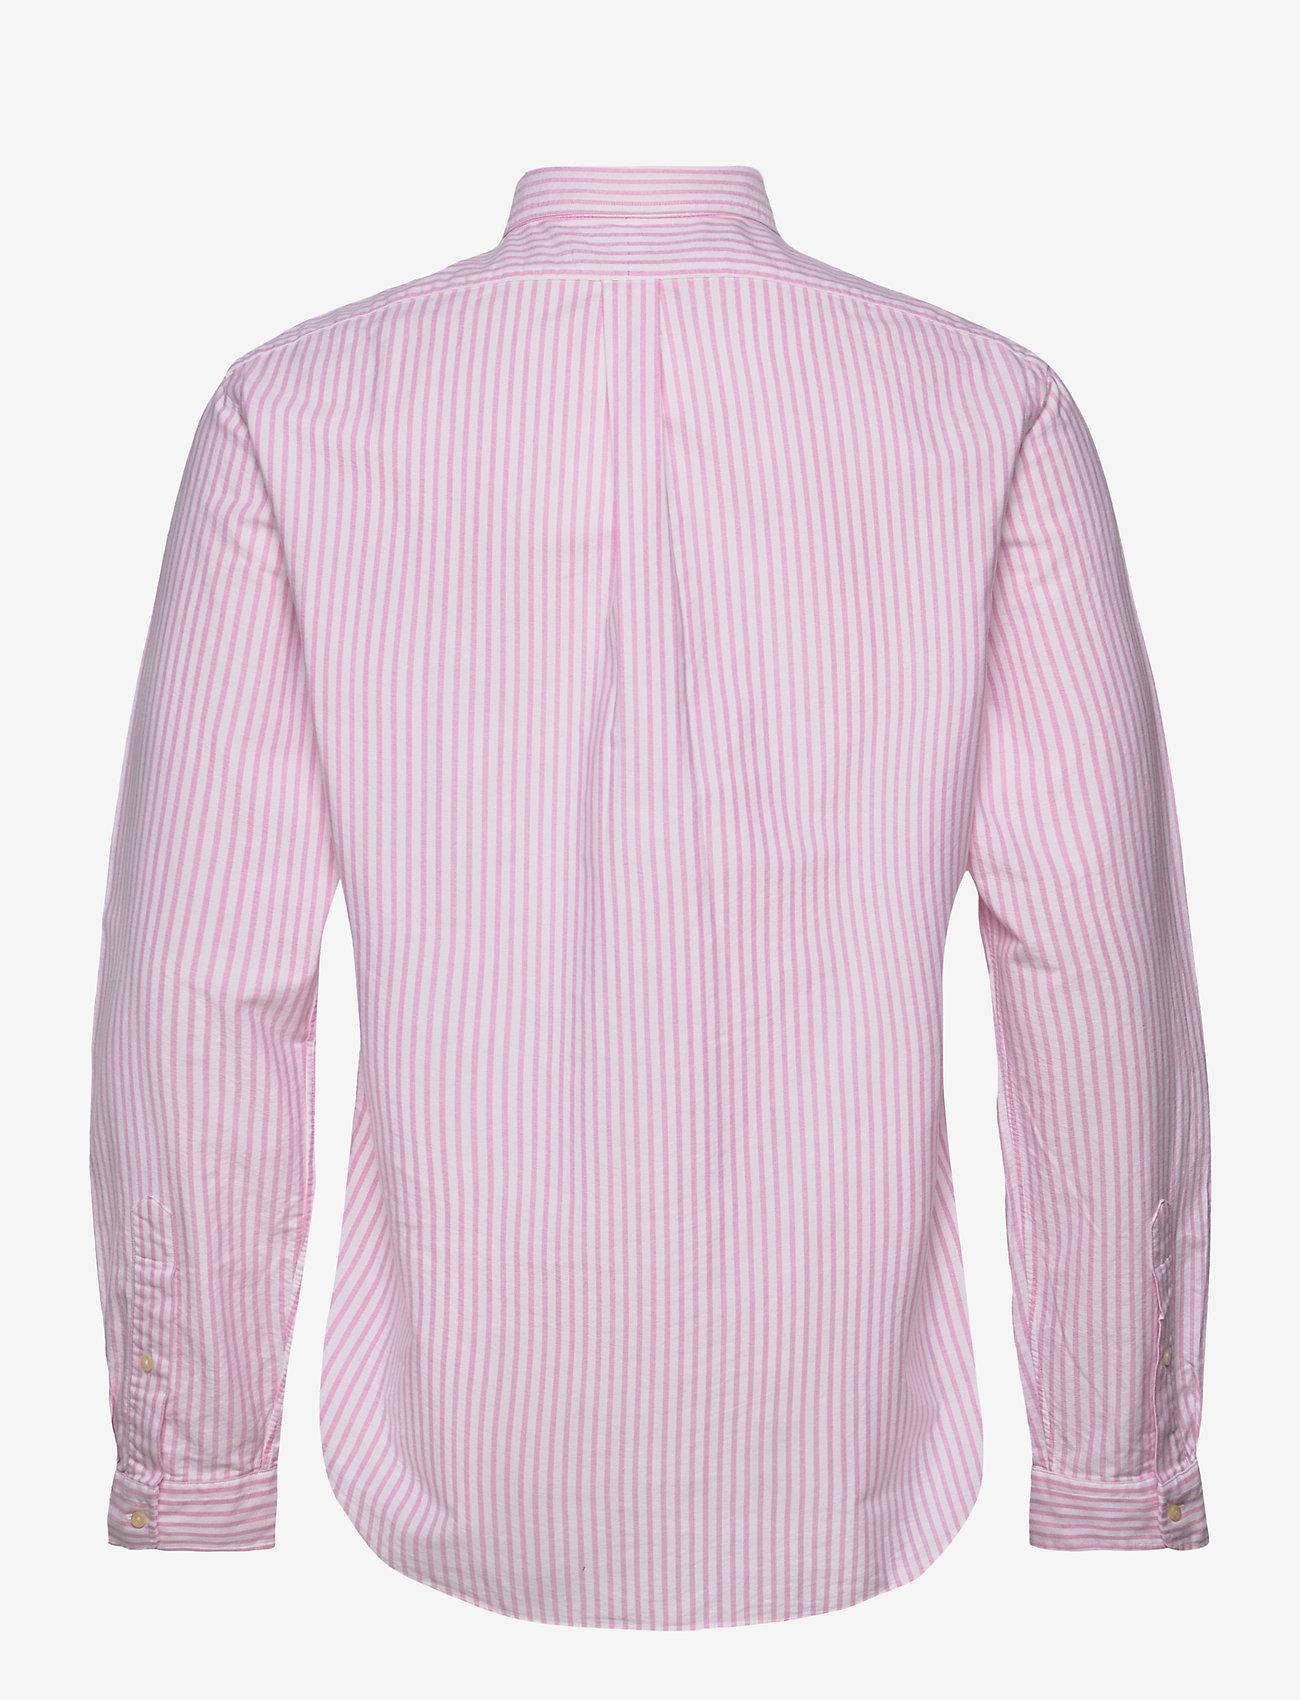 Polo Ralph Lauren - OXFORD-SLBDPPCS - oxford shirts - 2600b rose pink/w - 1